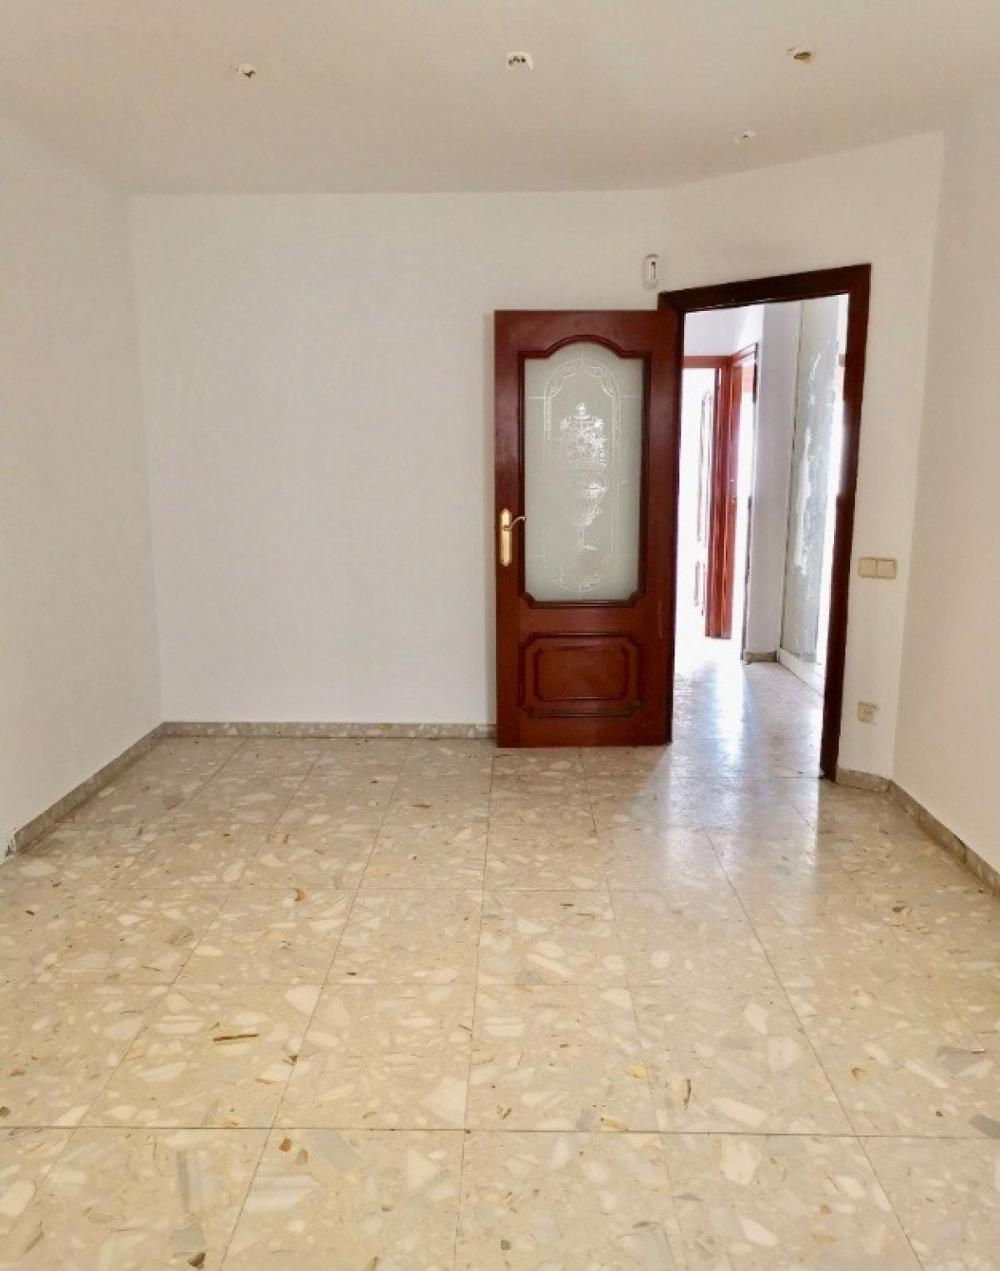 coll blanc barcelona Wohnung foto 3783379